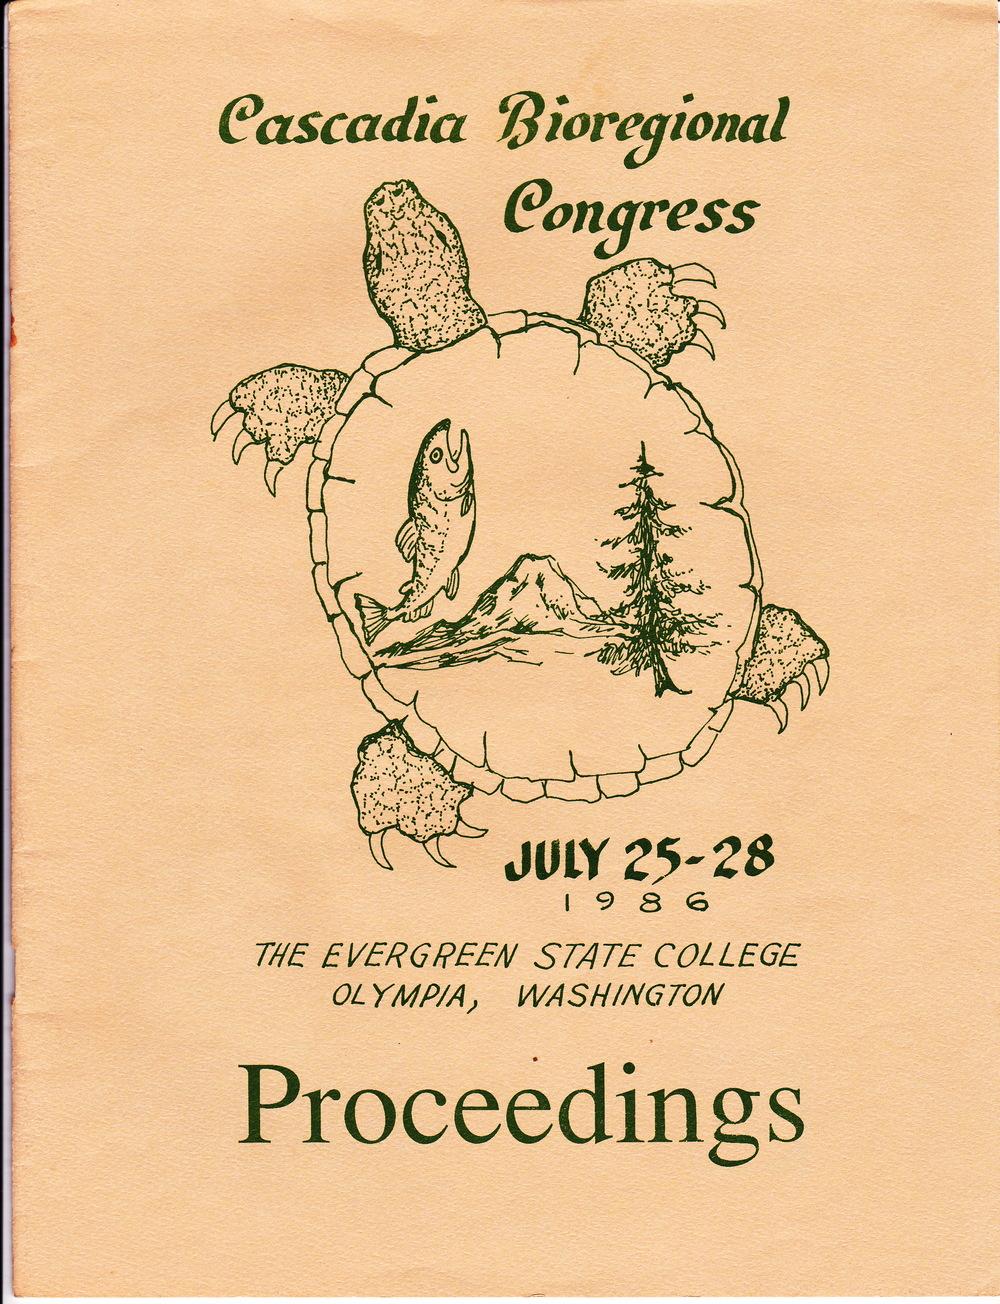 Cascadia Bioregional Congress 1986